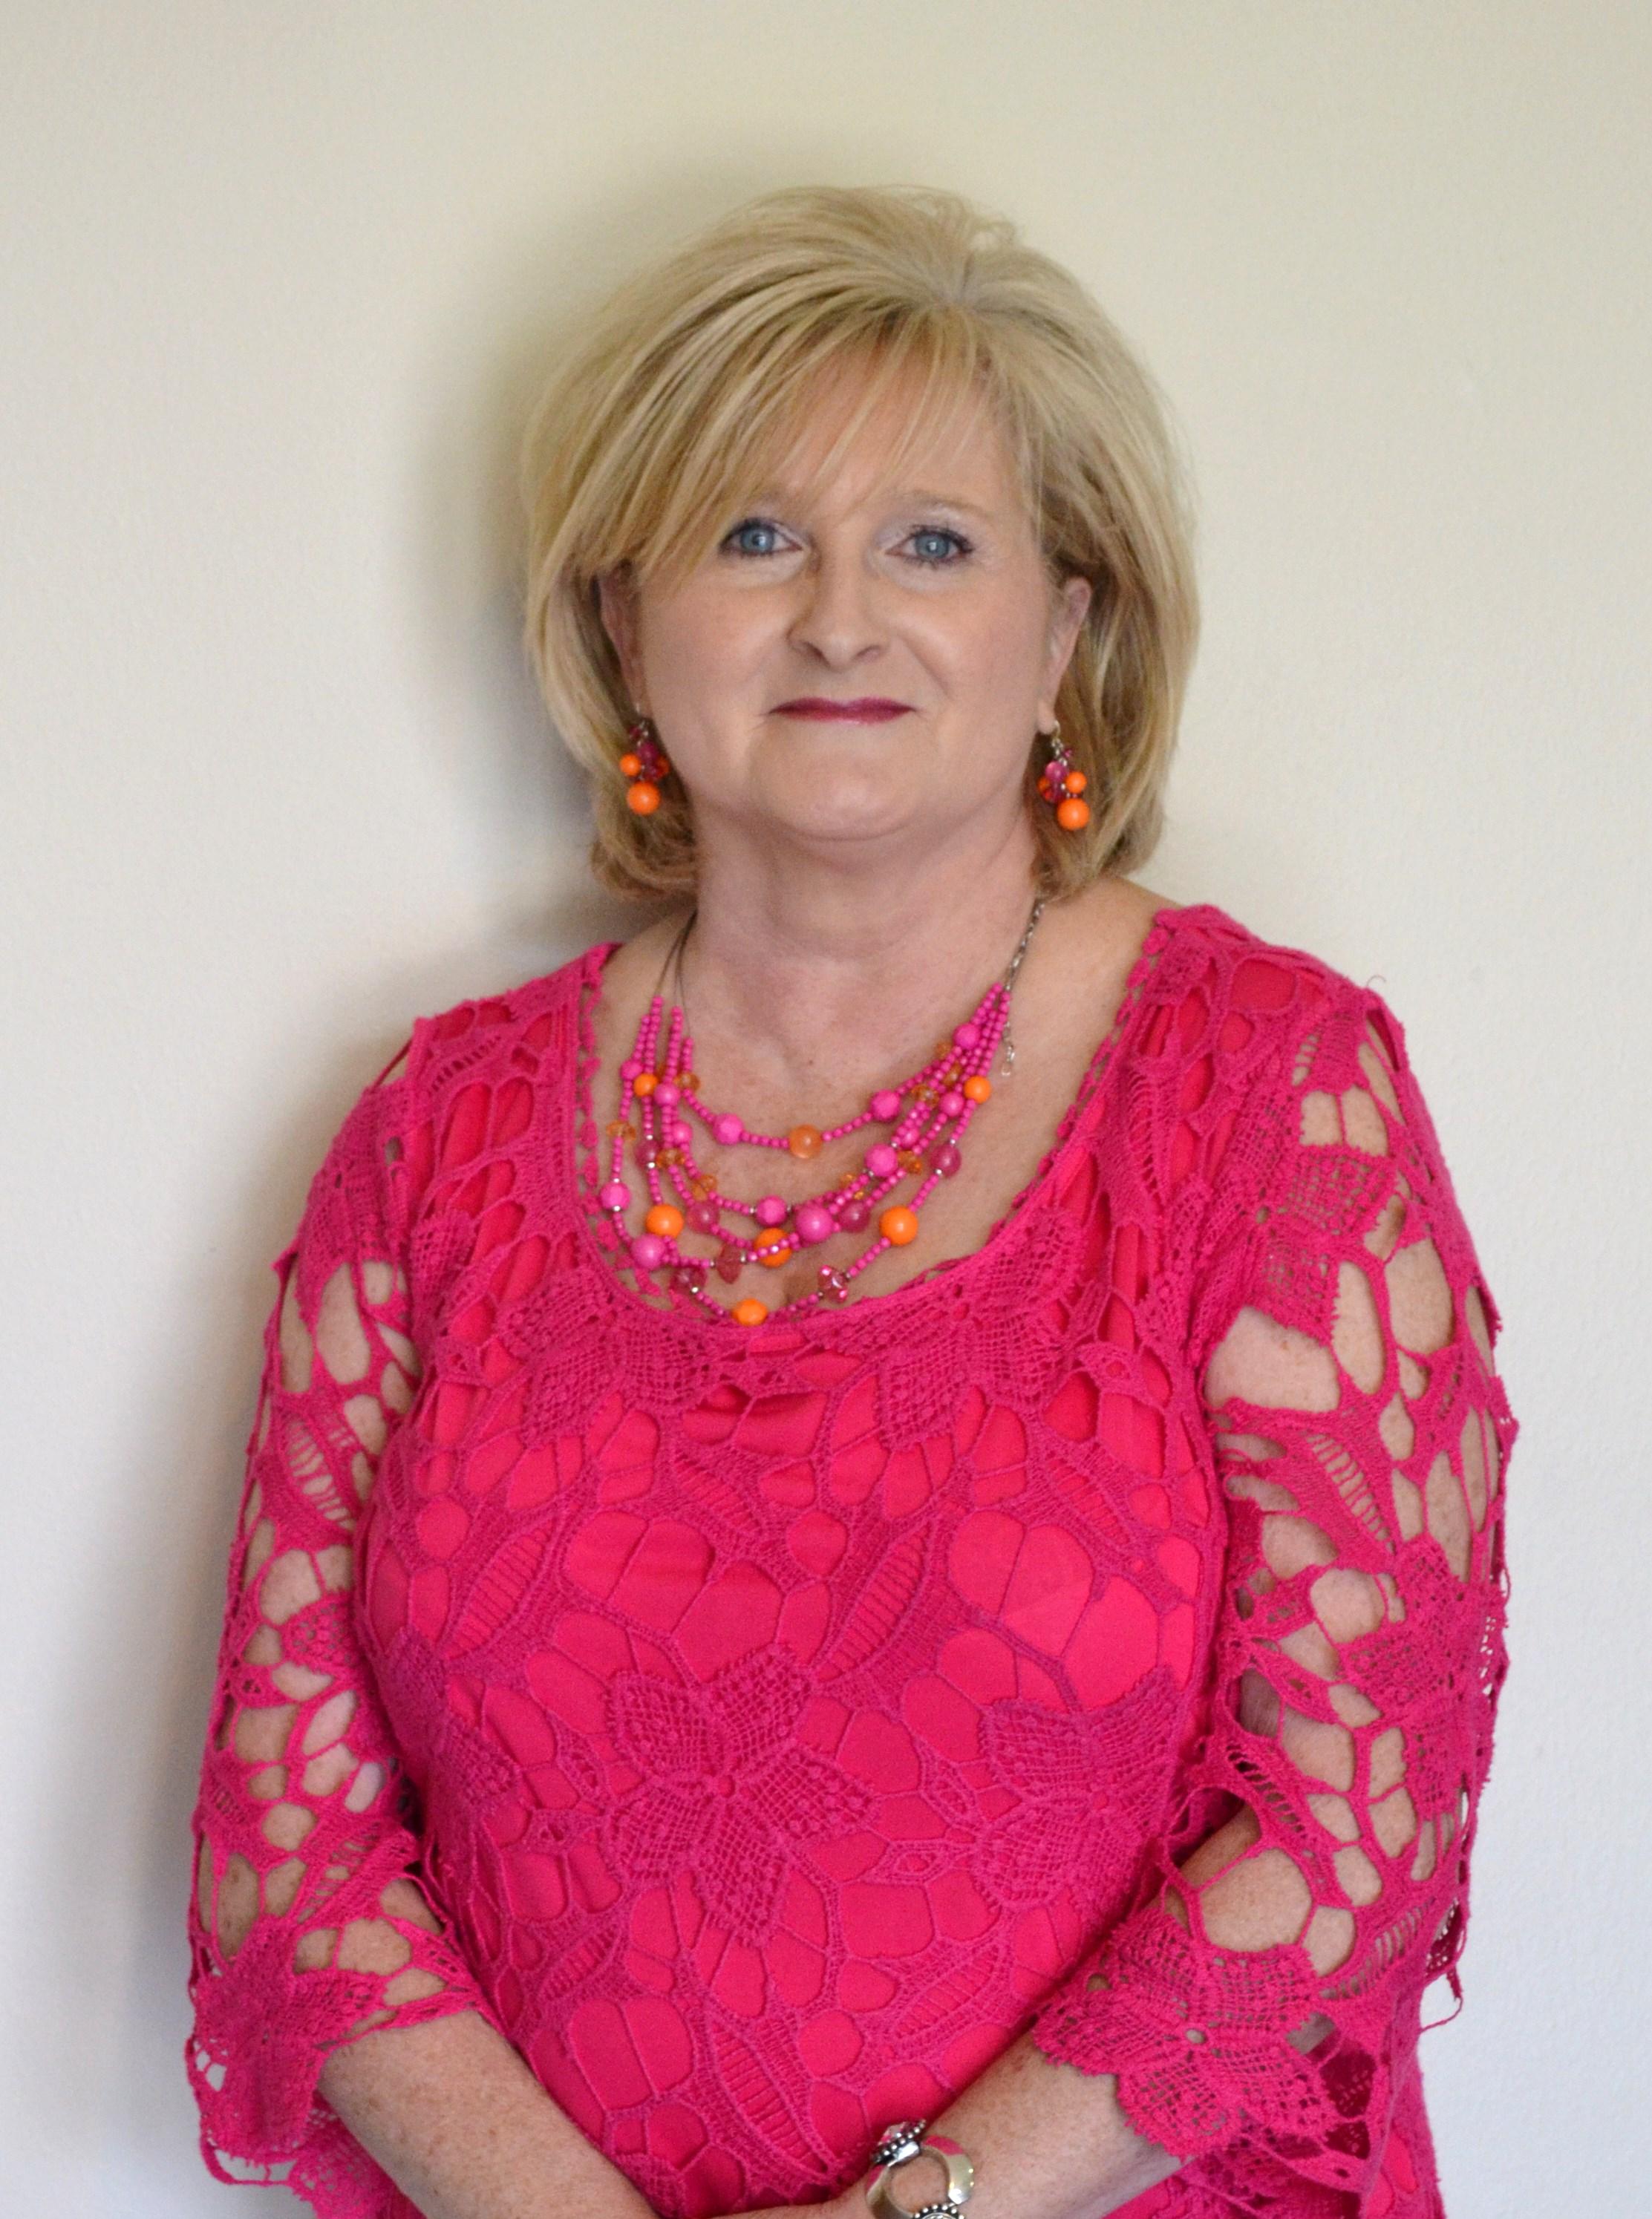 Vickie Stell